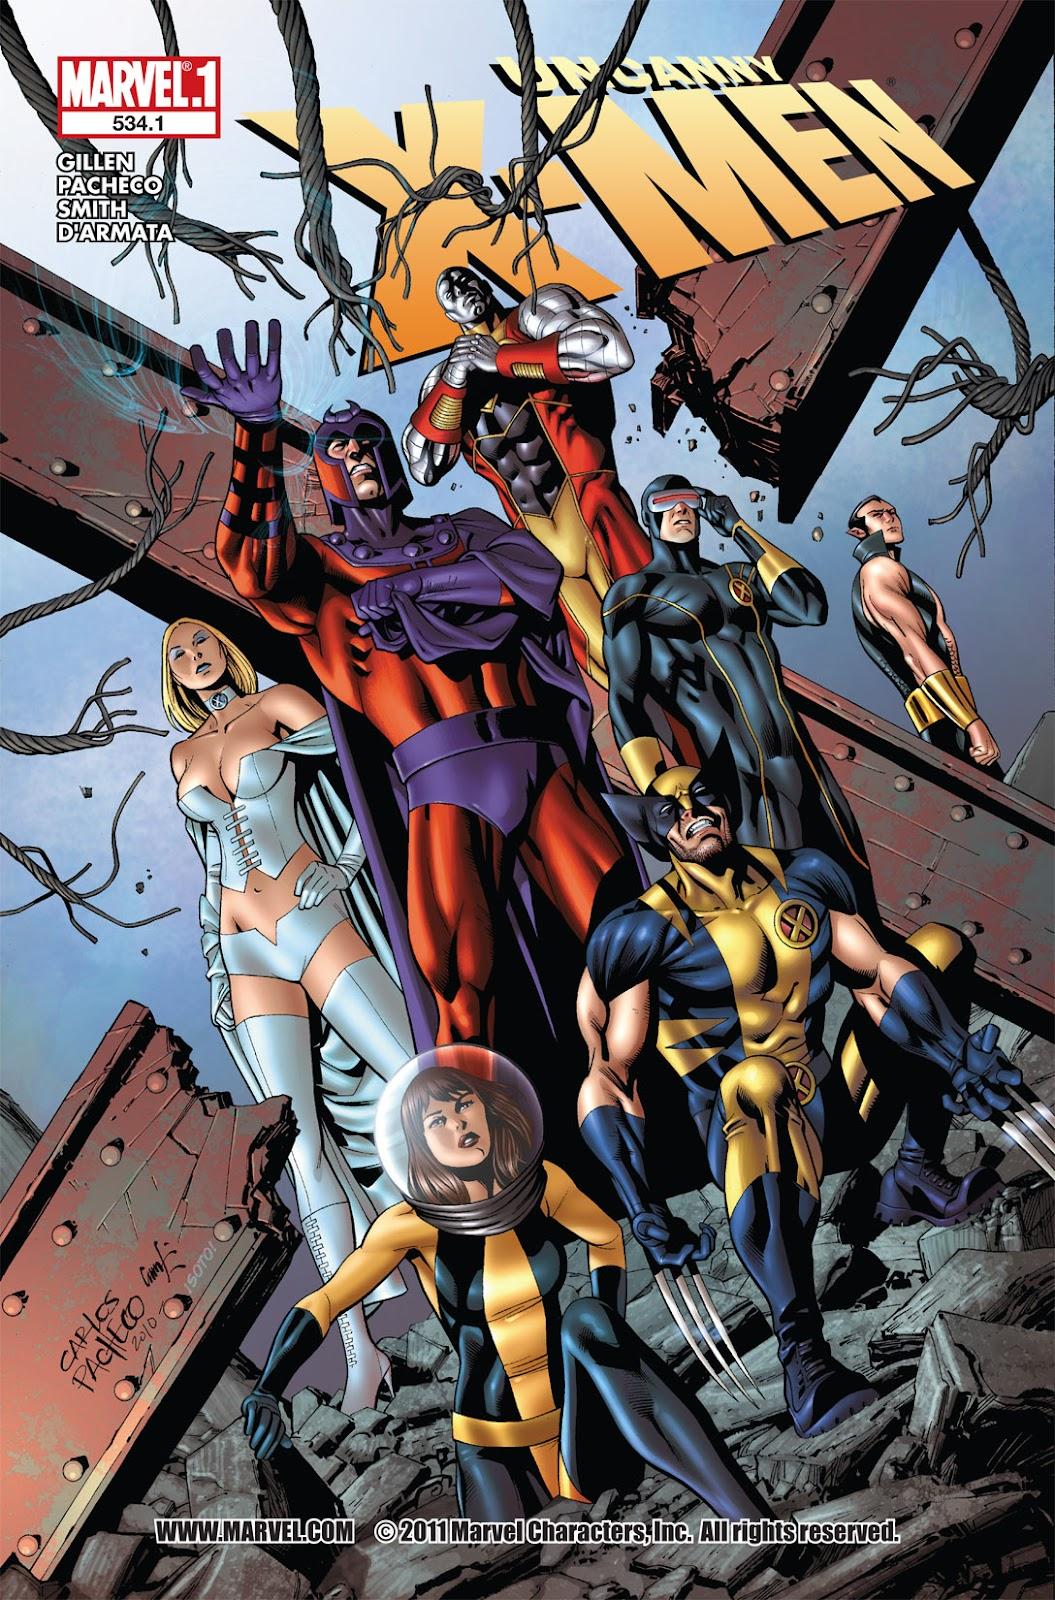 Uncanny X-Men (1963) issue 534.1 - Page 1